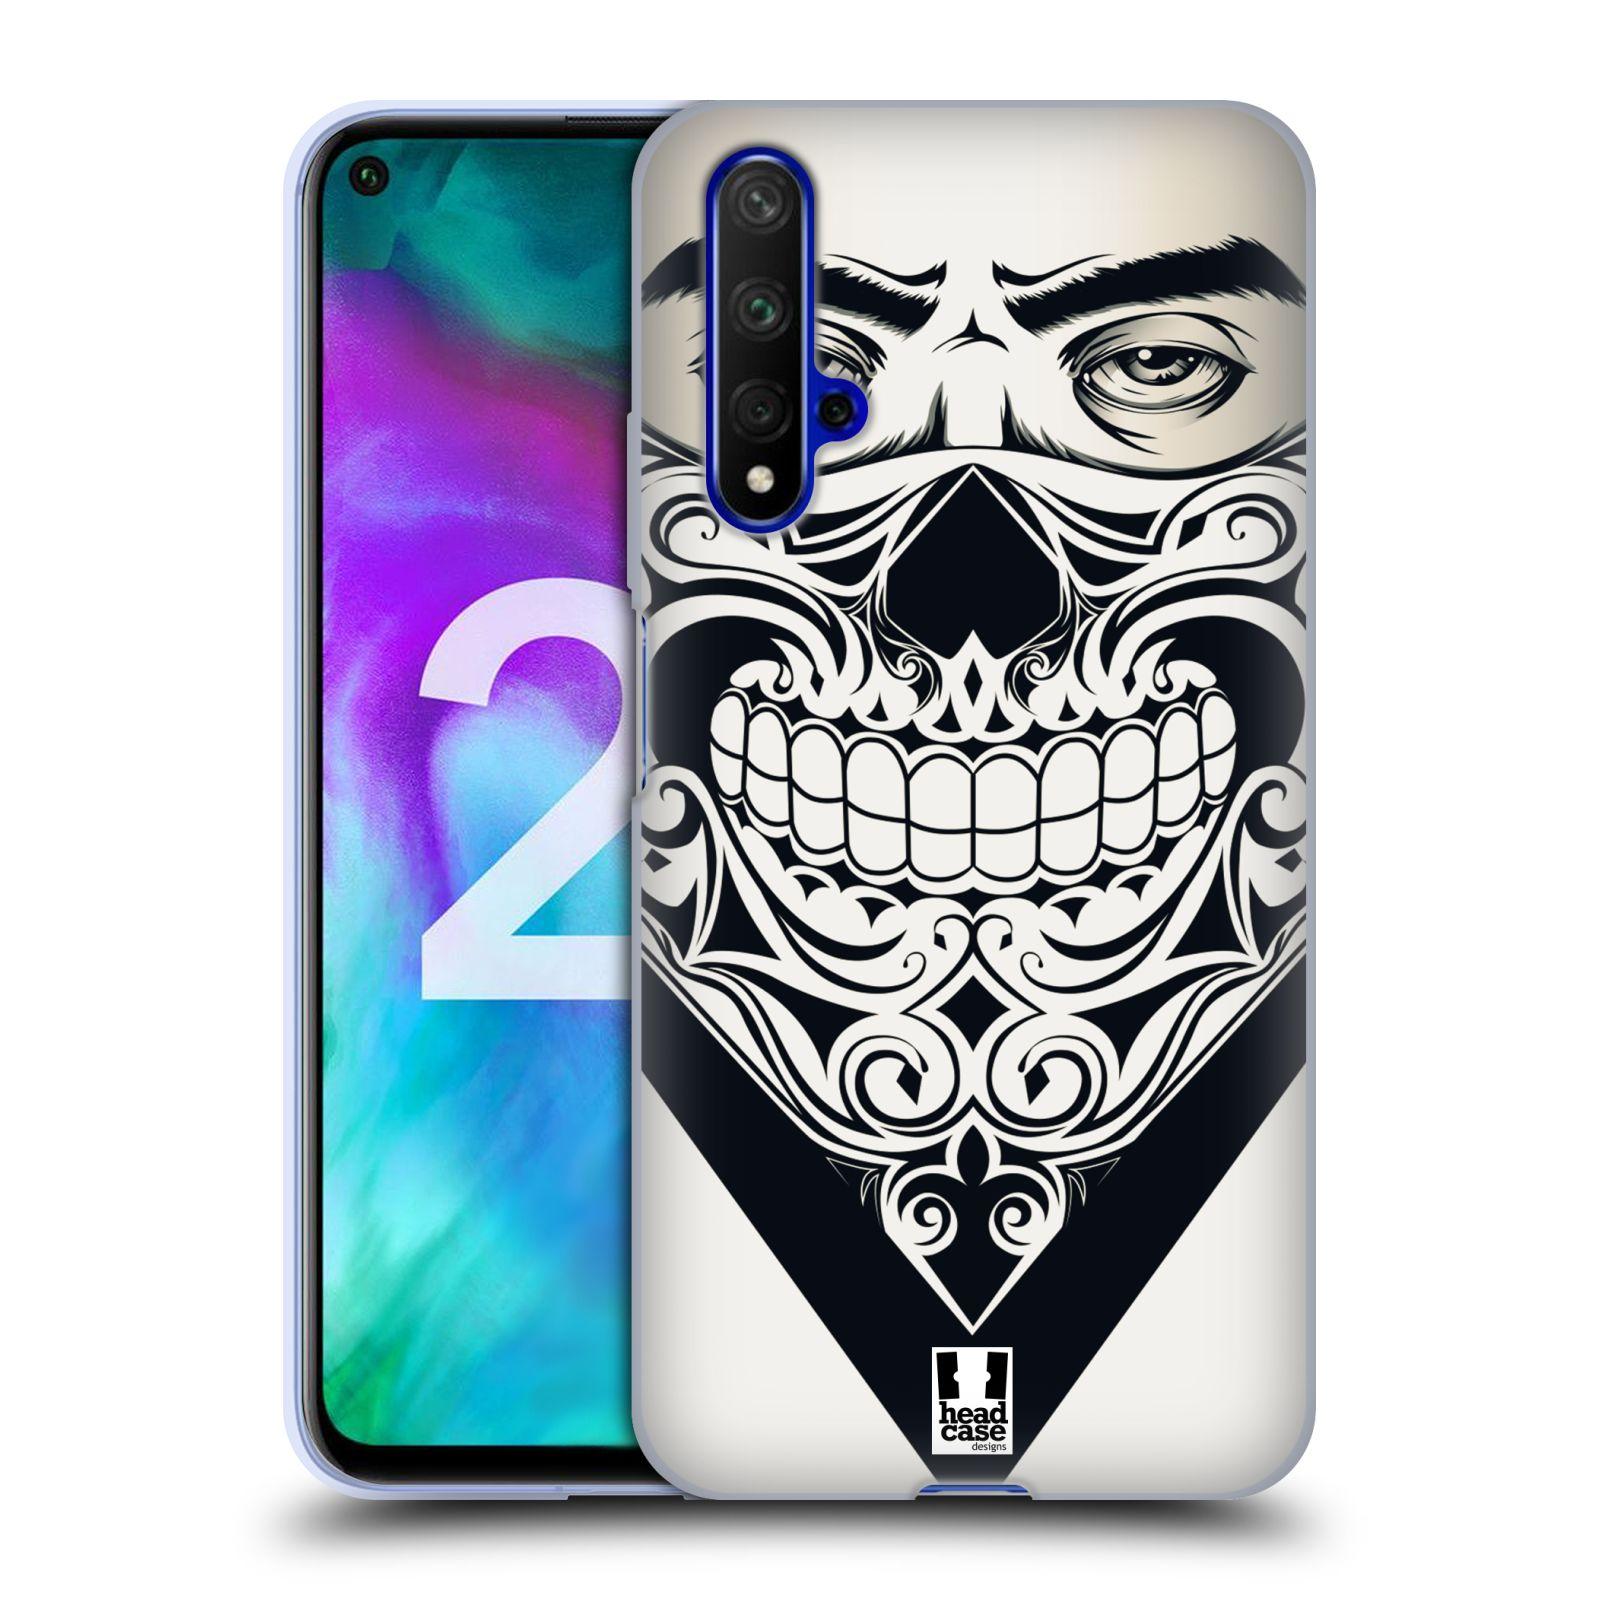 Silikonové pouzdro na mobil Honor 20 - Head Case - LEBKA BANDANA